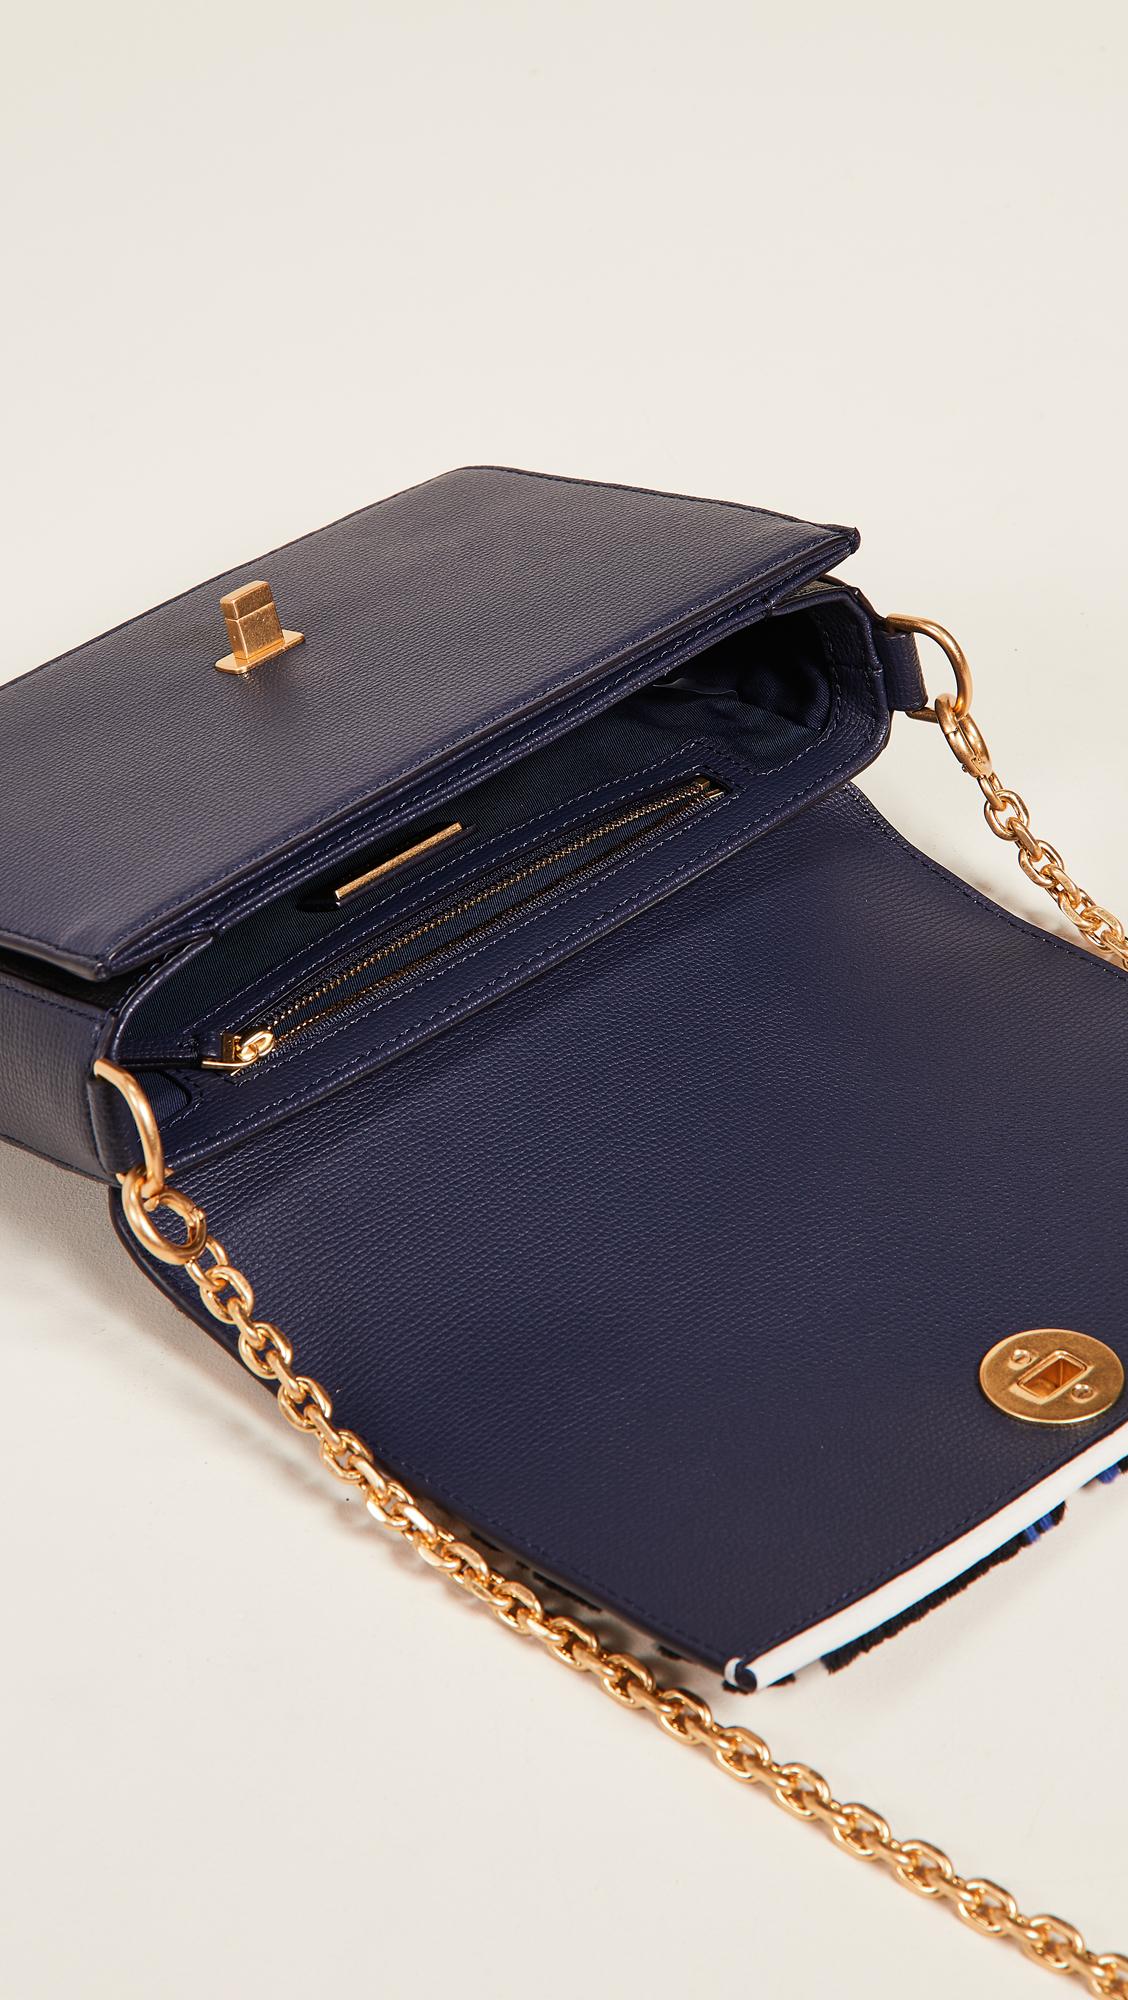 3a6294c1fe0 Tory Burch Kira Fil Coupe Shoulder Bag